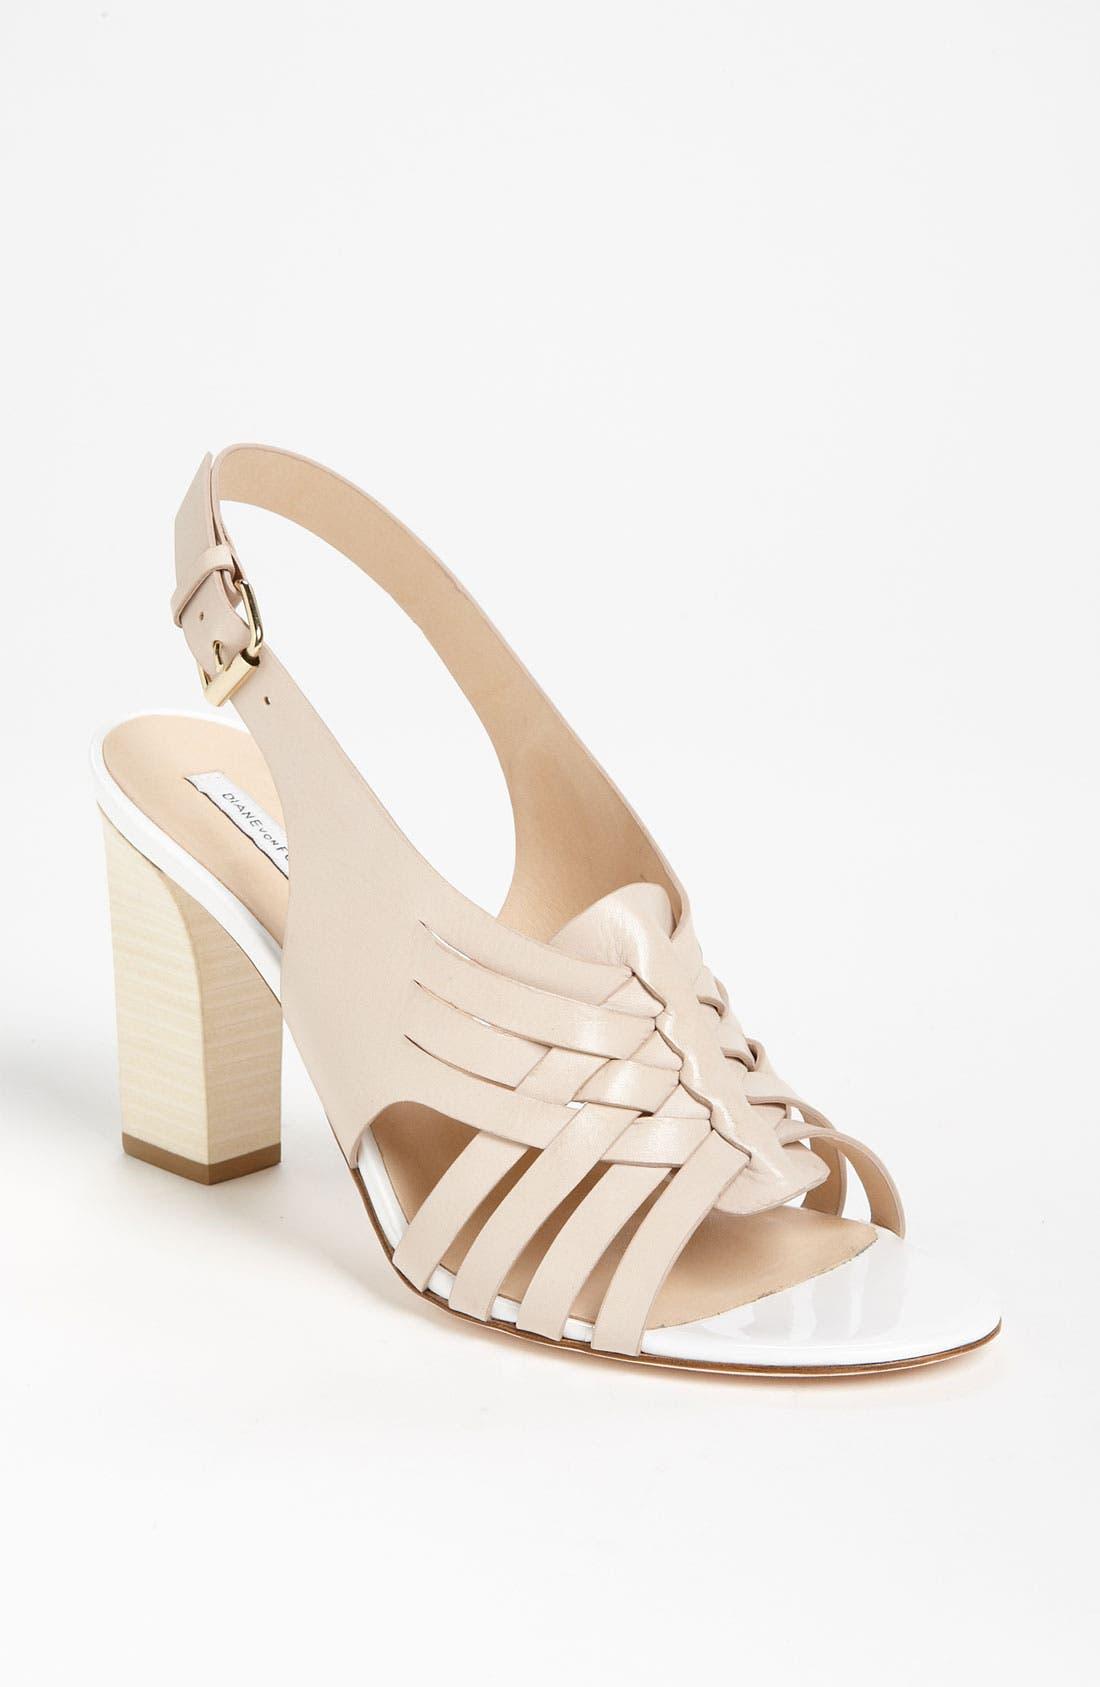 Main Image - Diane von Furstenberg 'Taite' Sandal